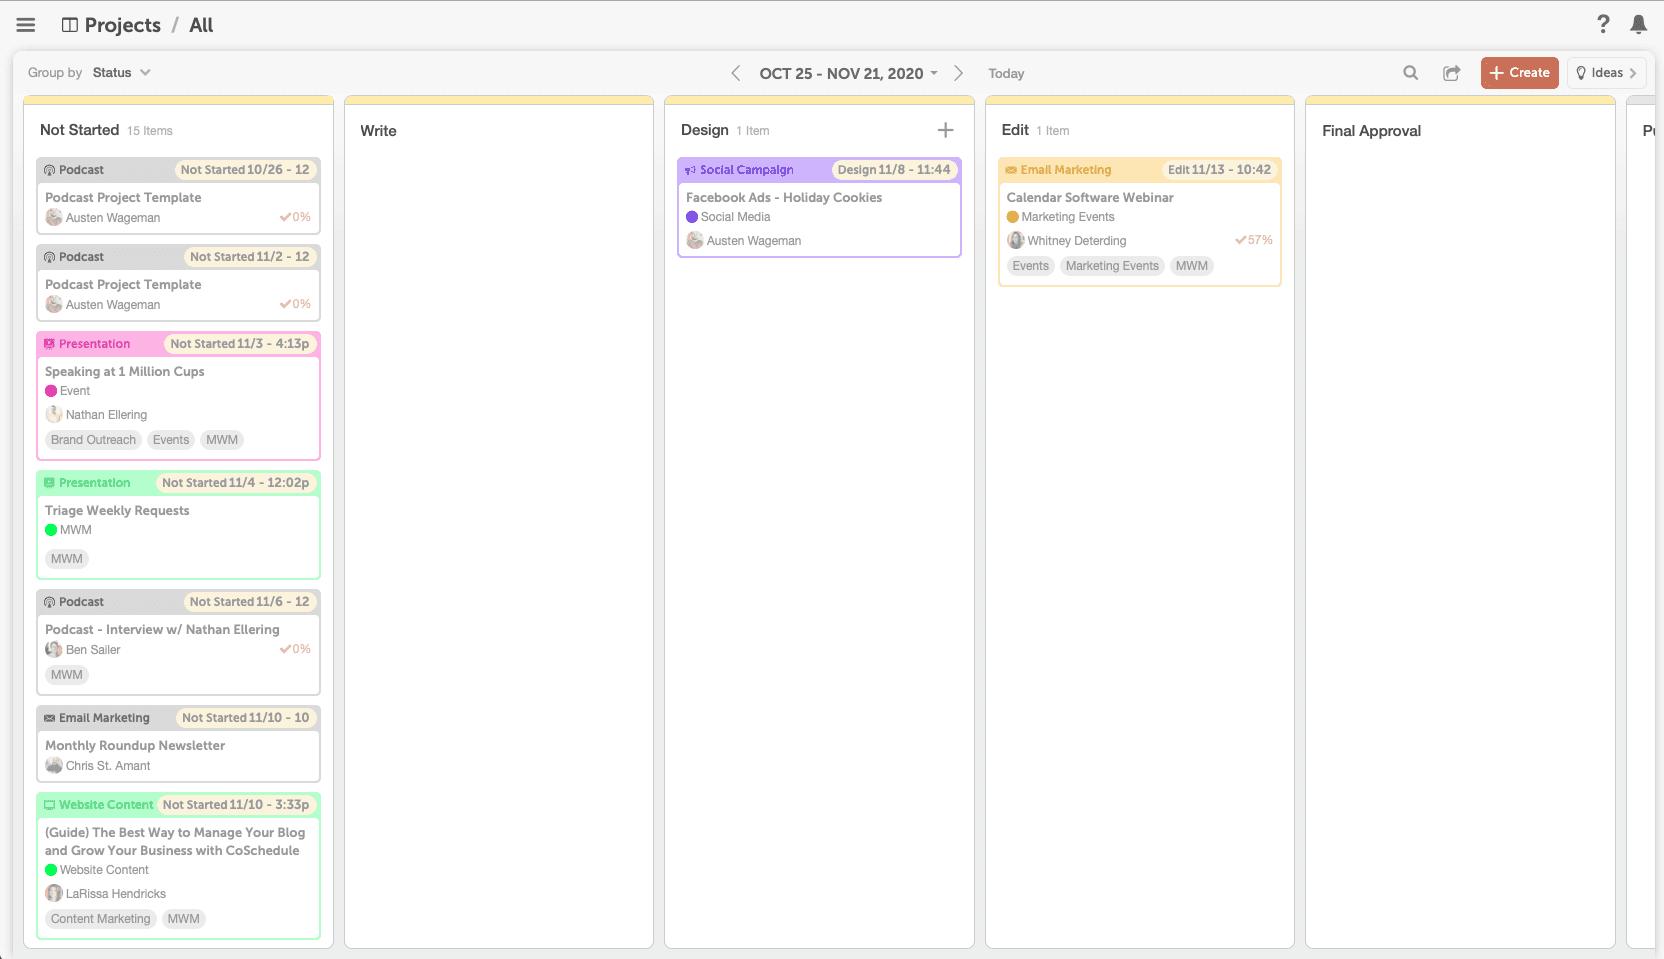 CoSchedule kanban calendar view